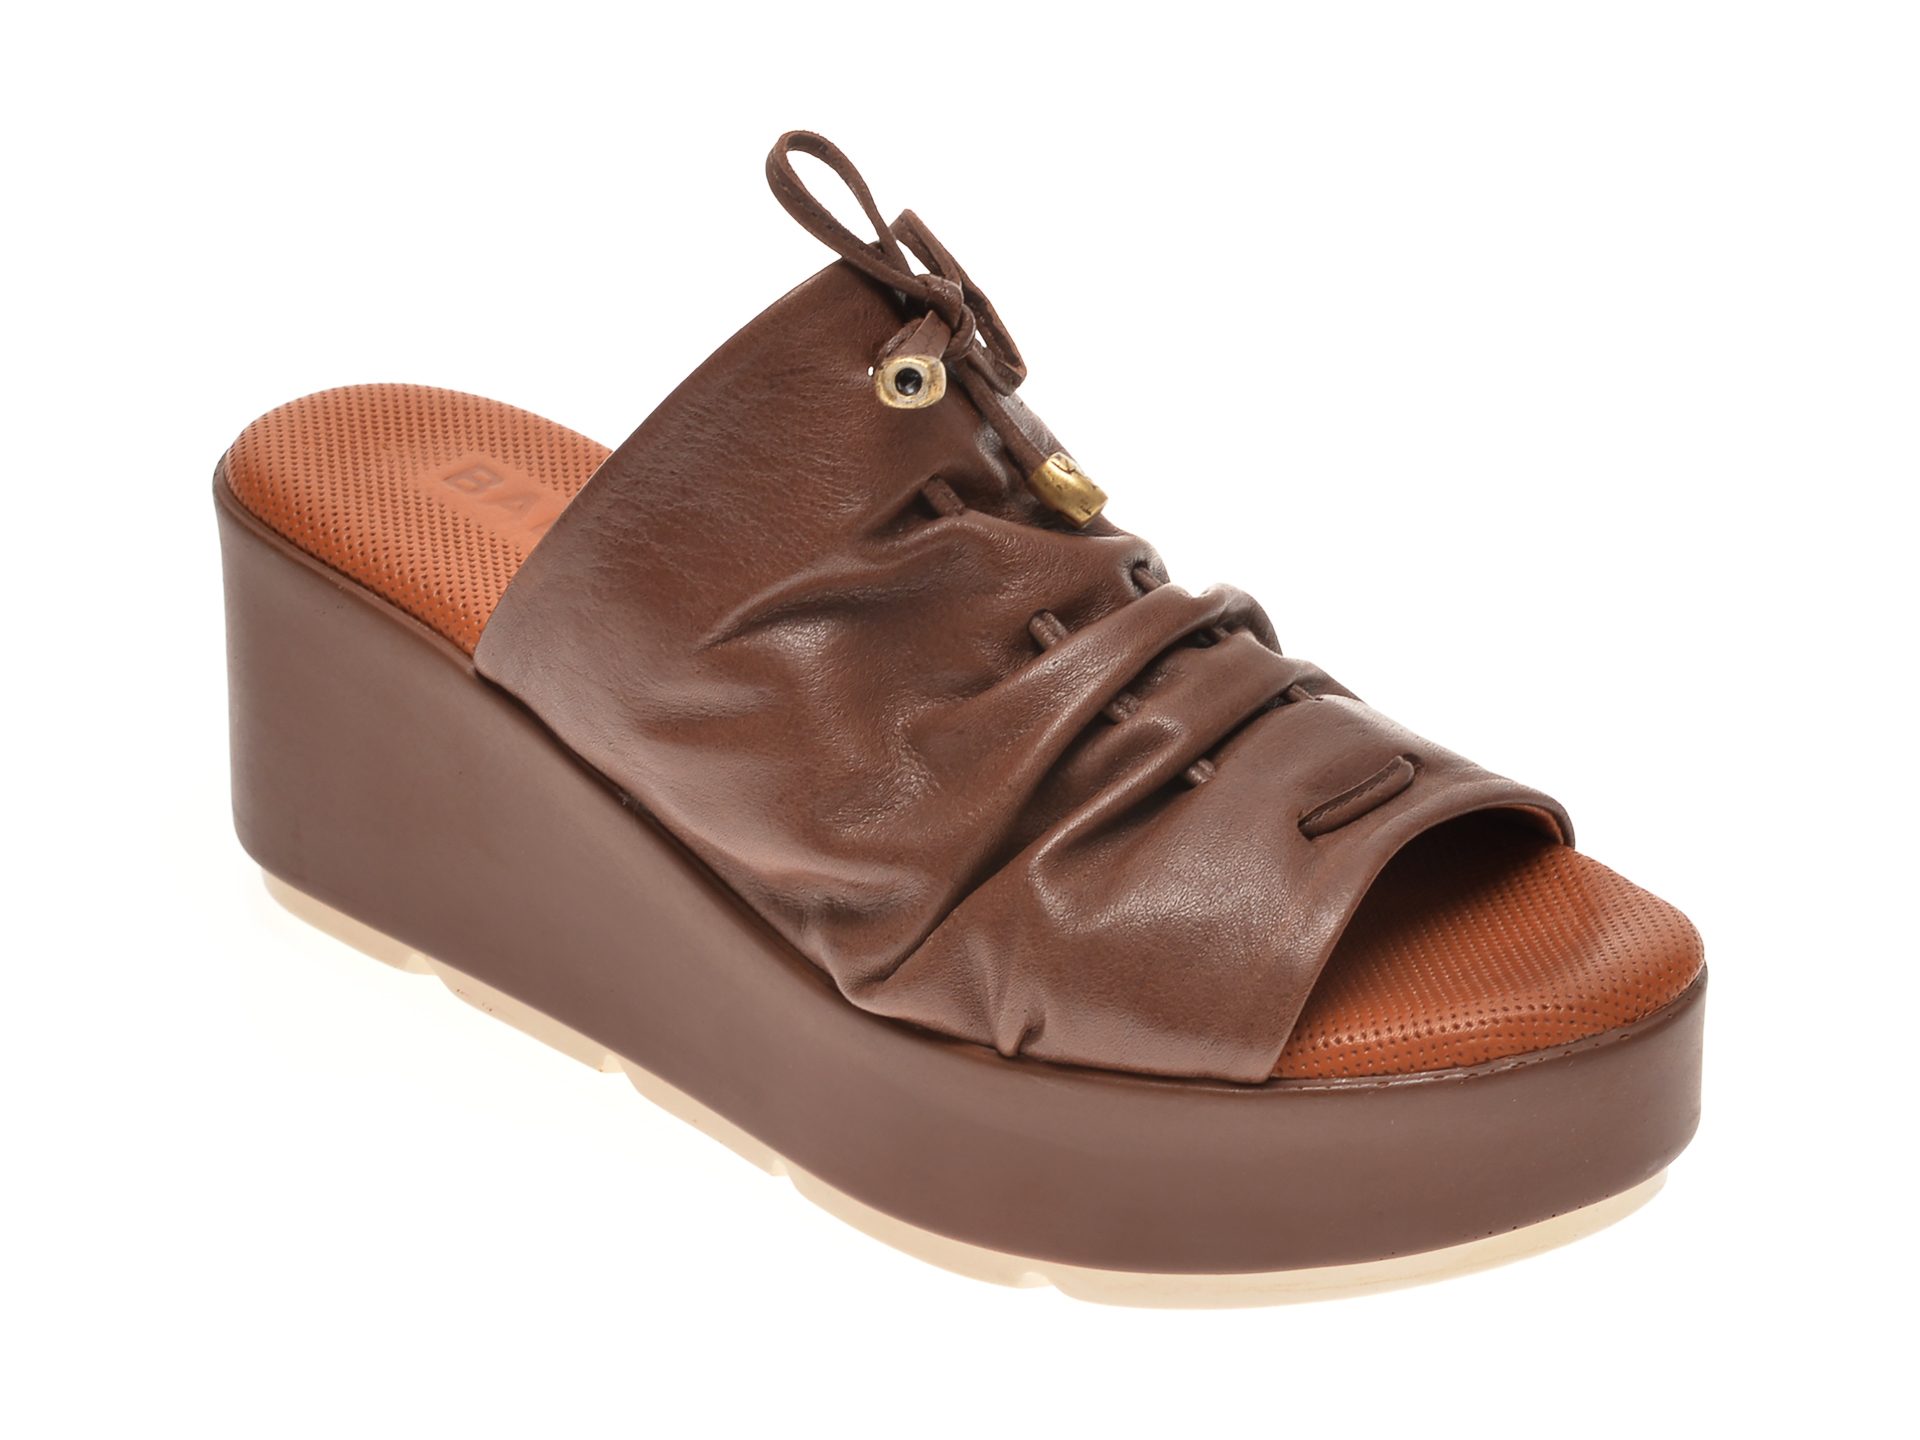 Papuci BABOOS maro, 2512, din piele naturala imagine